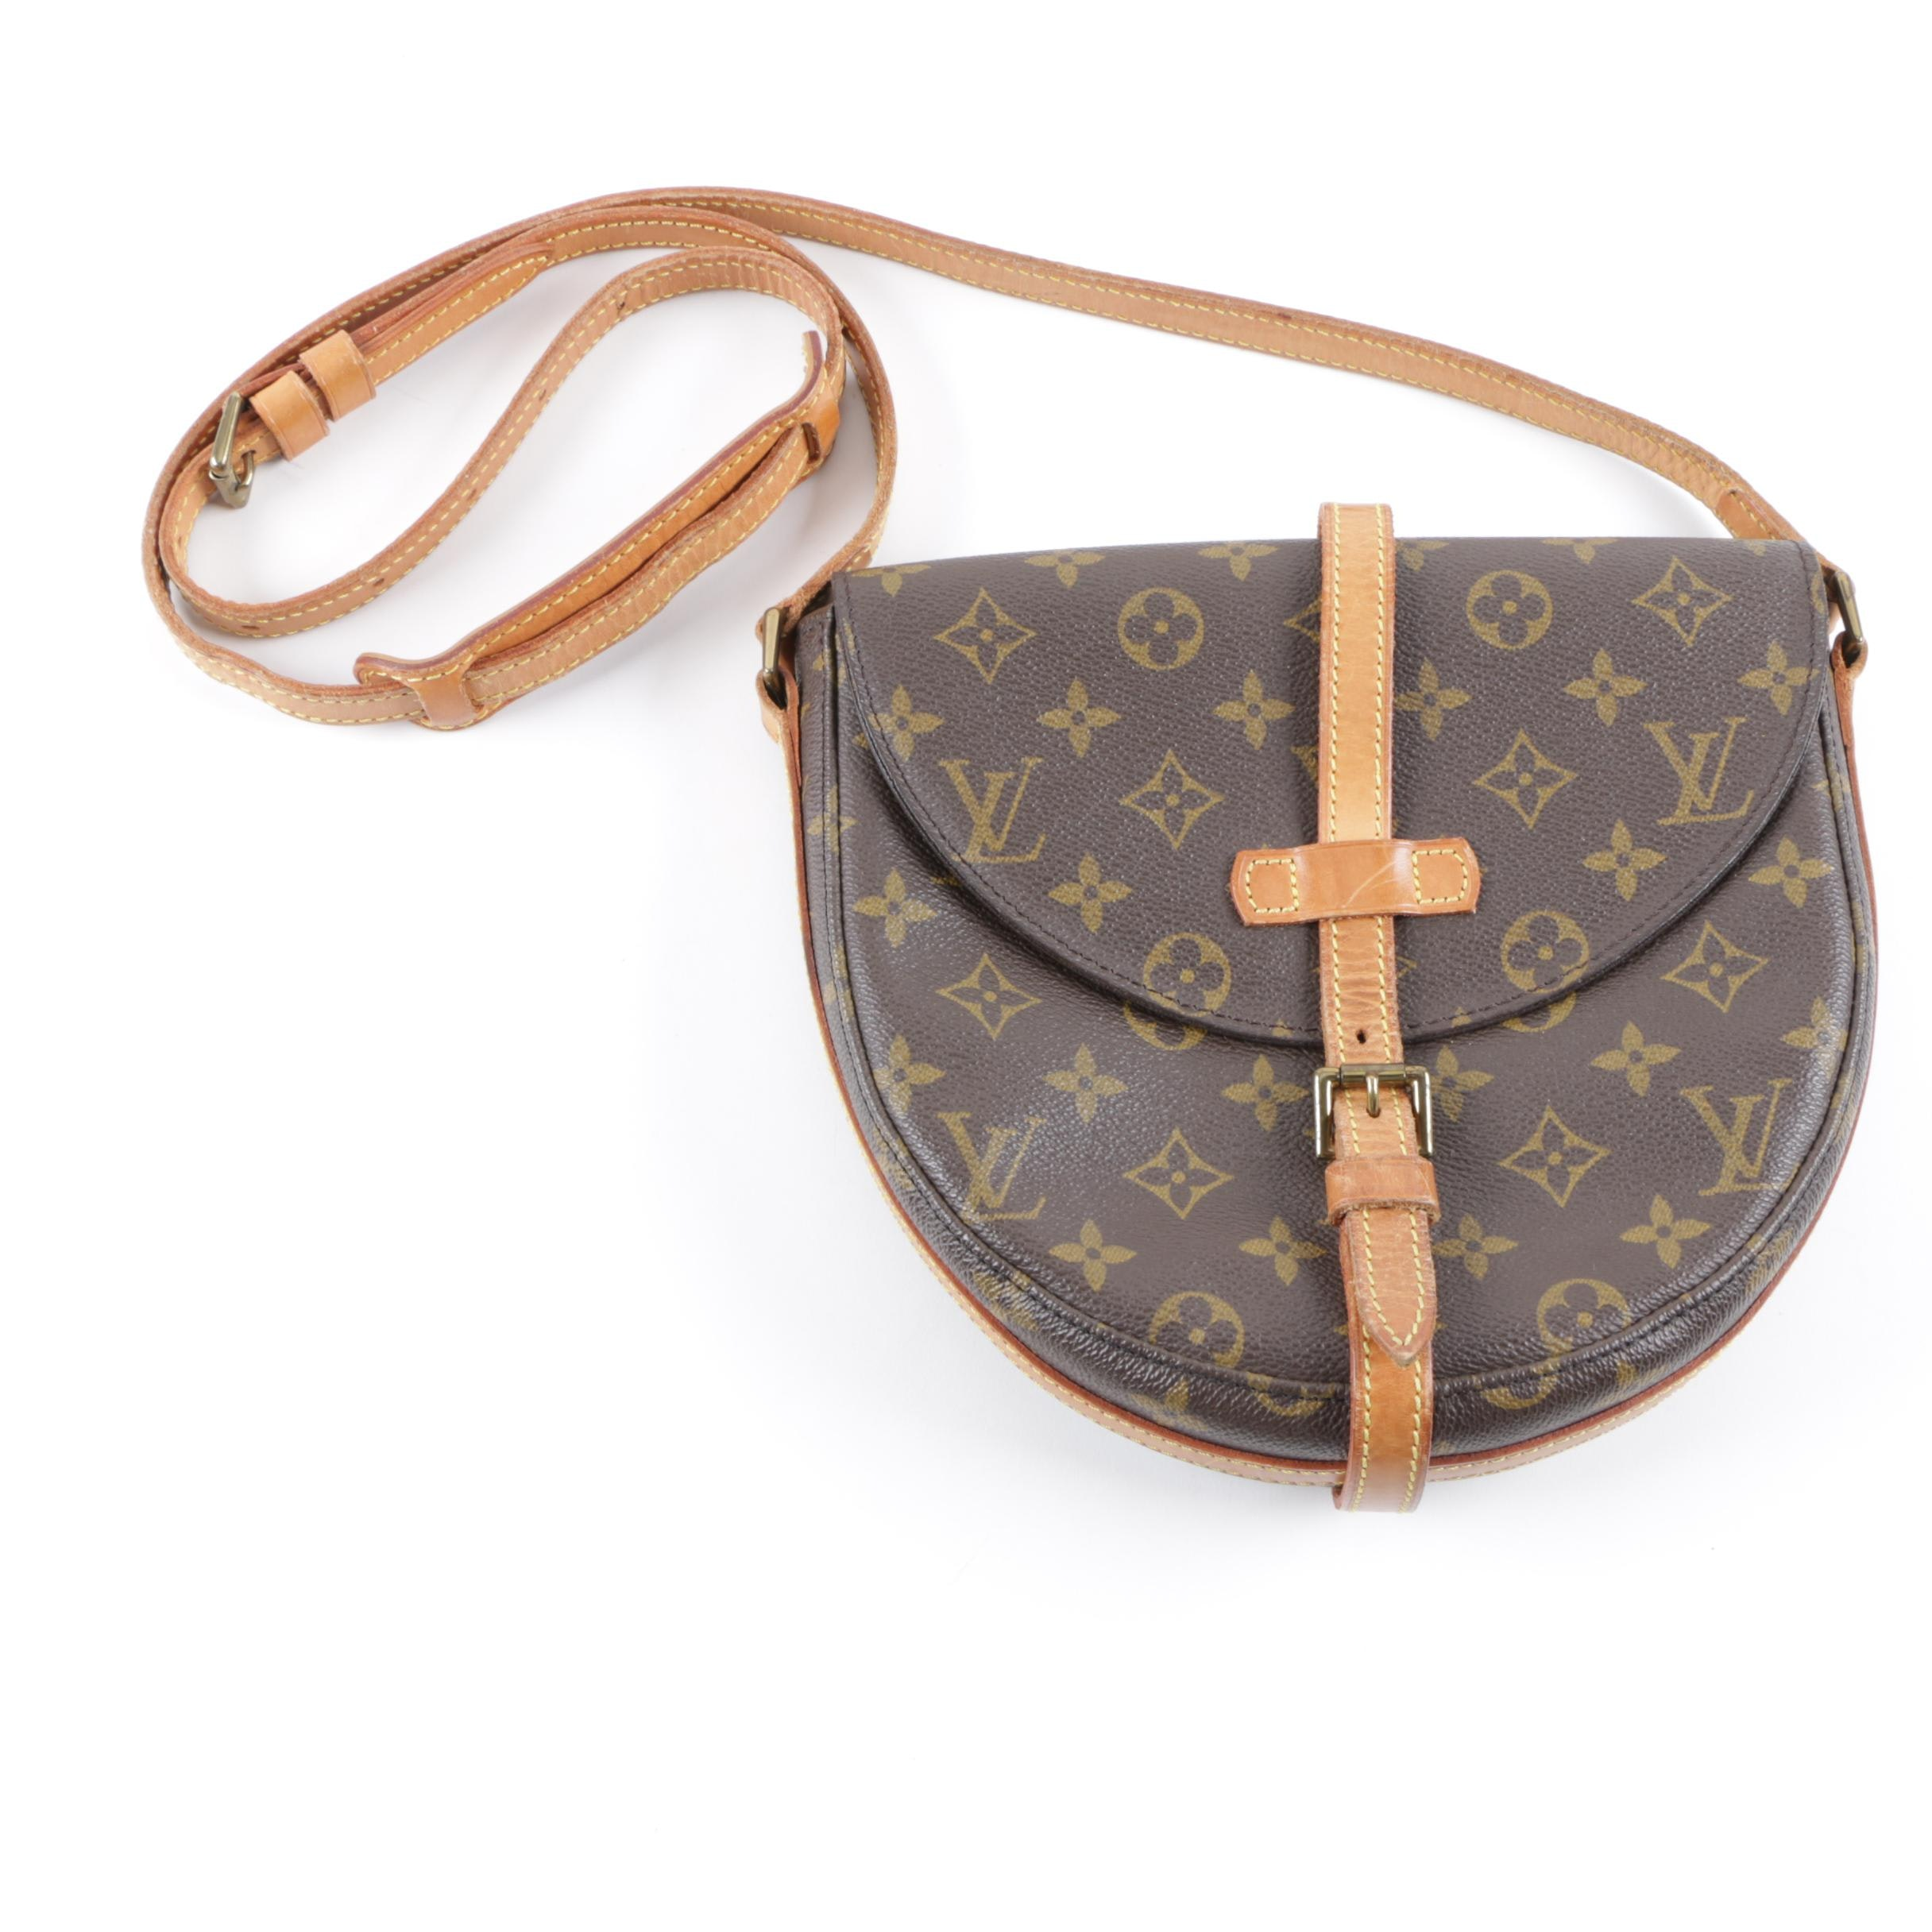 Vintage Louis Vuitton Monogram Chantilly MM Crossbody Bag